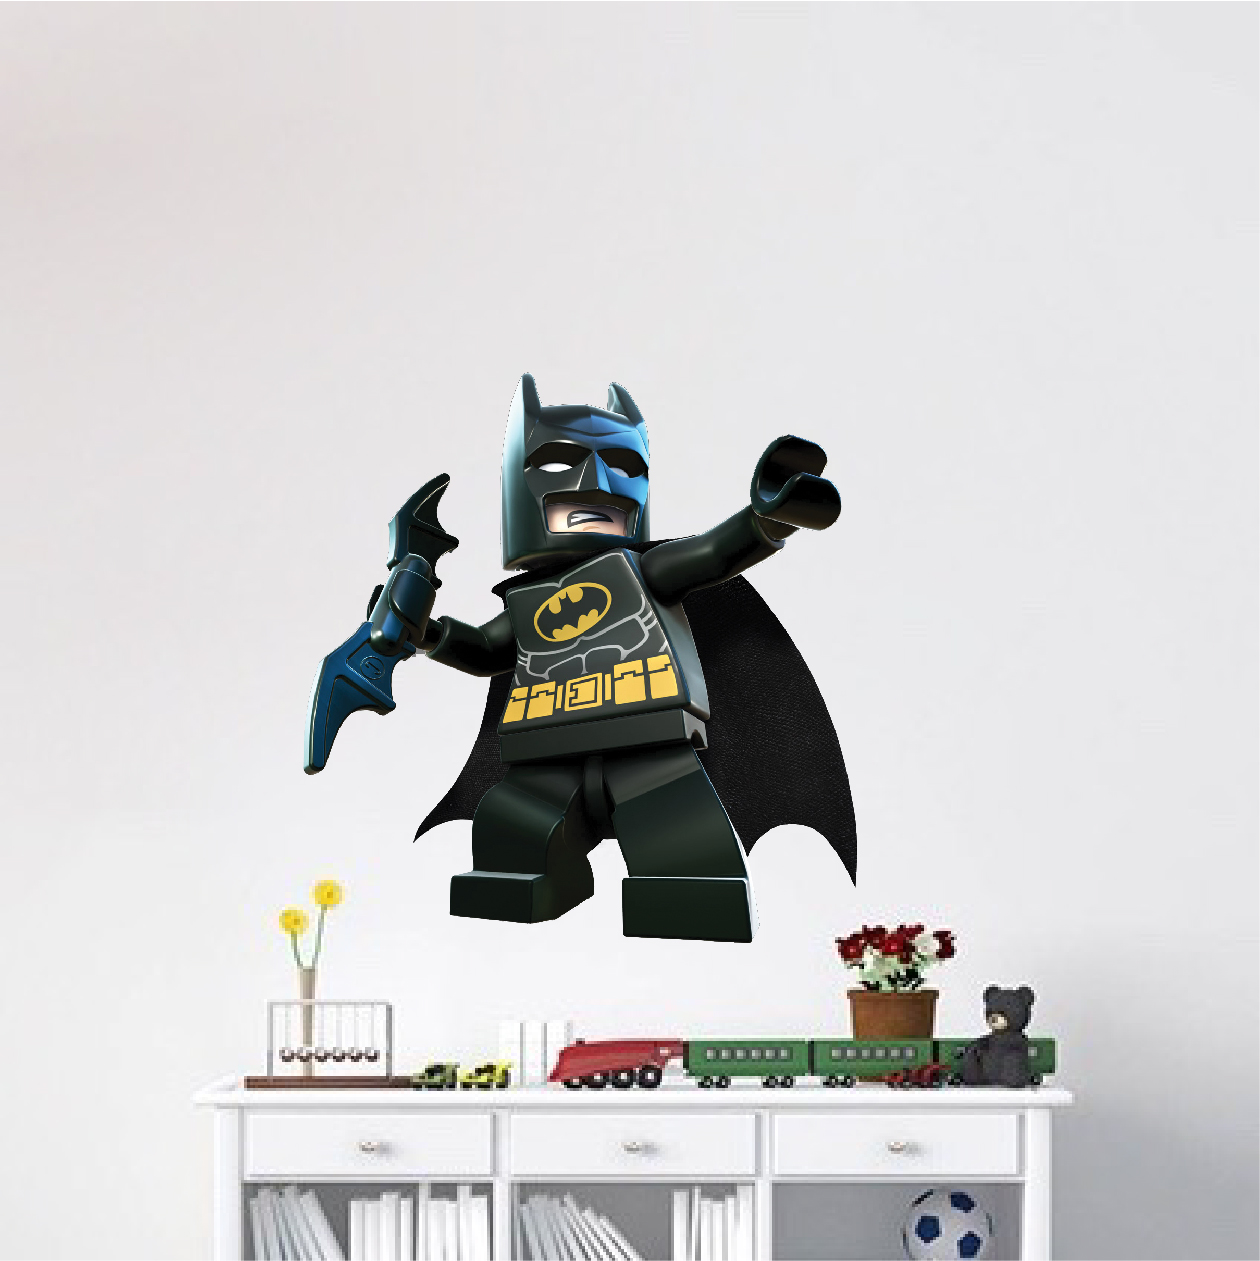 Lego Batman Wall Decal - Superhero Wall Design